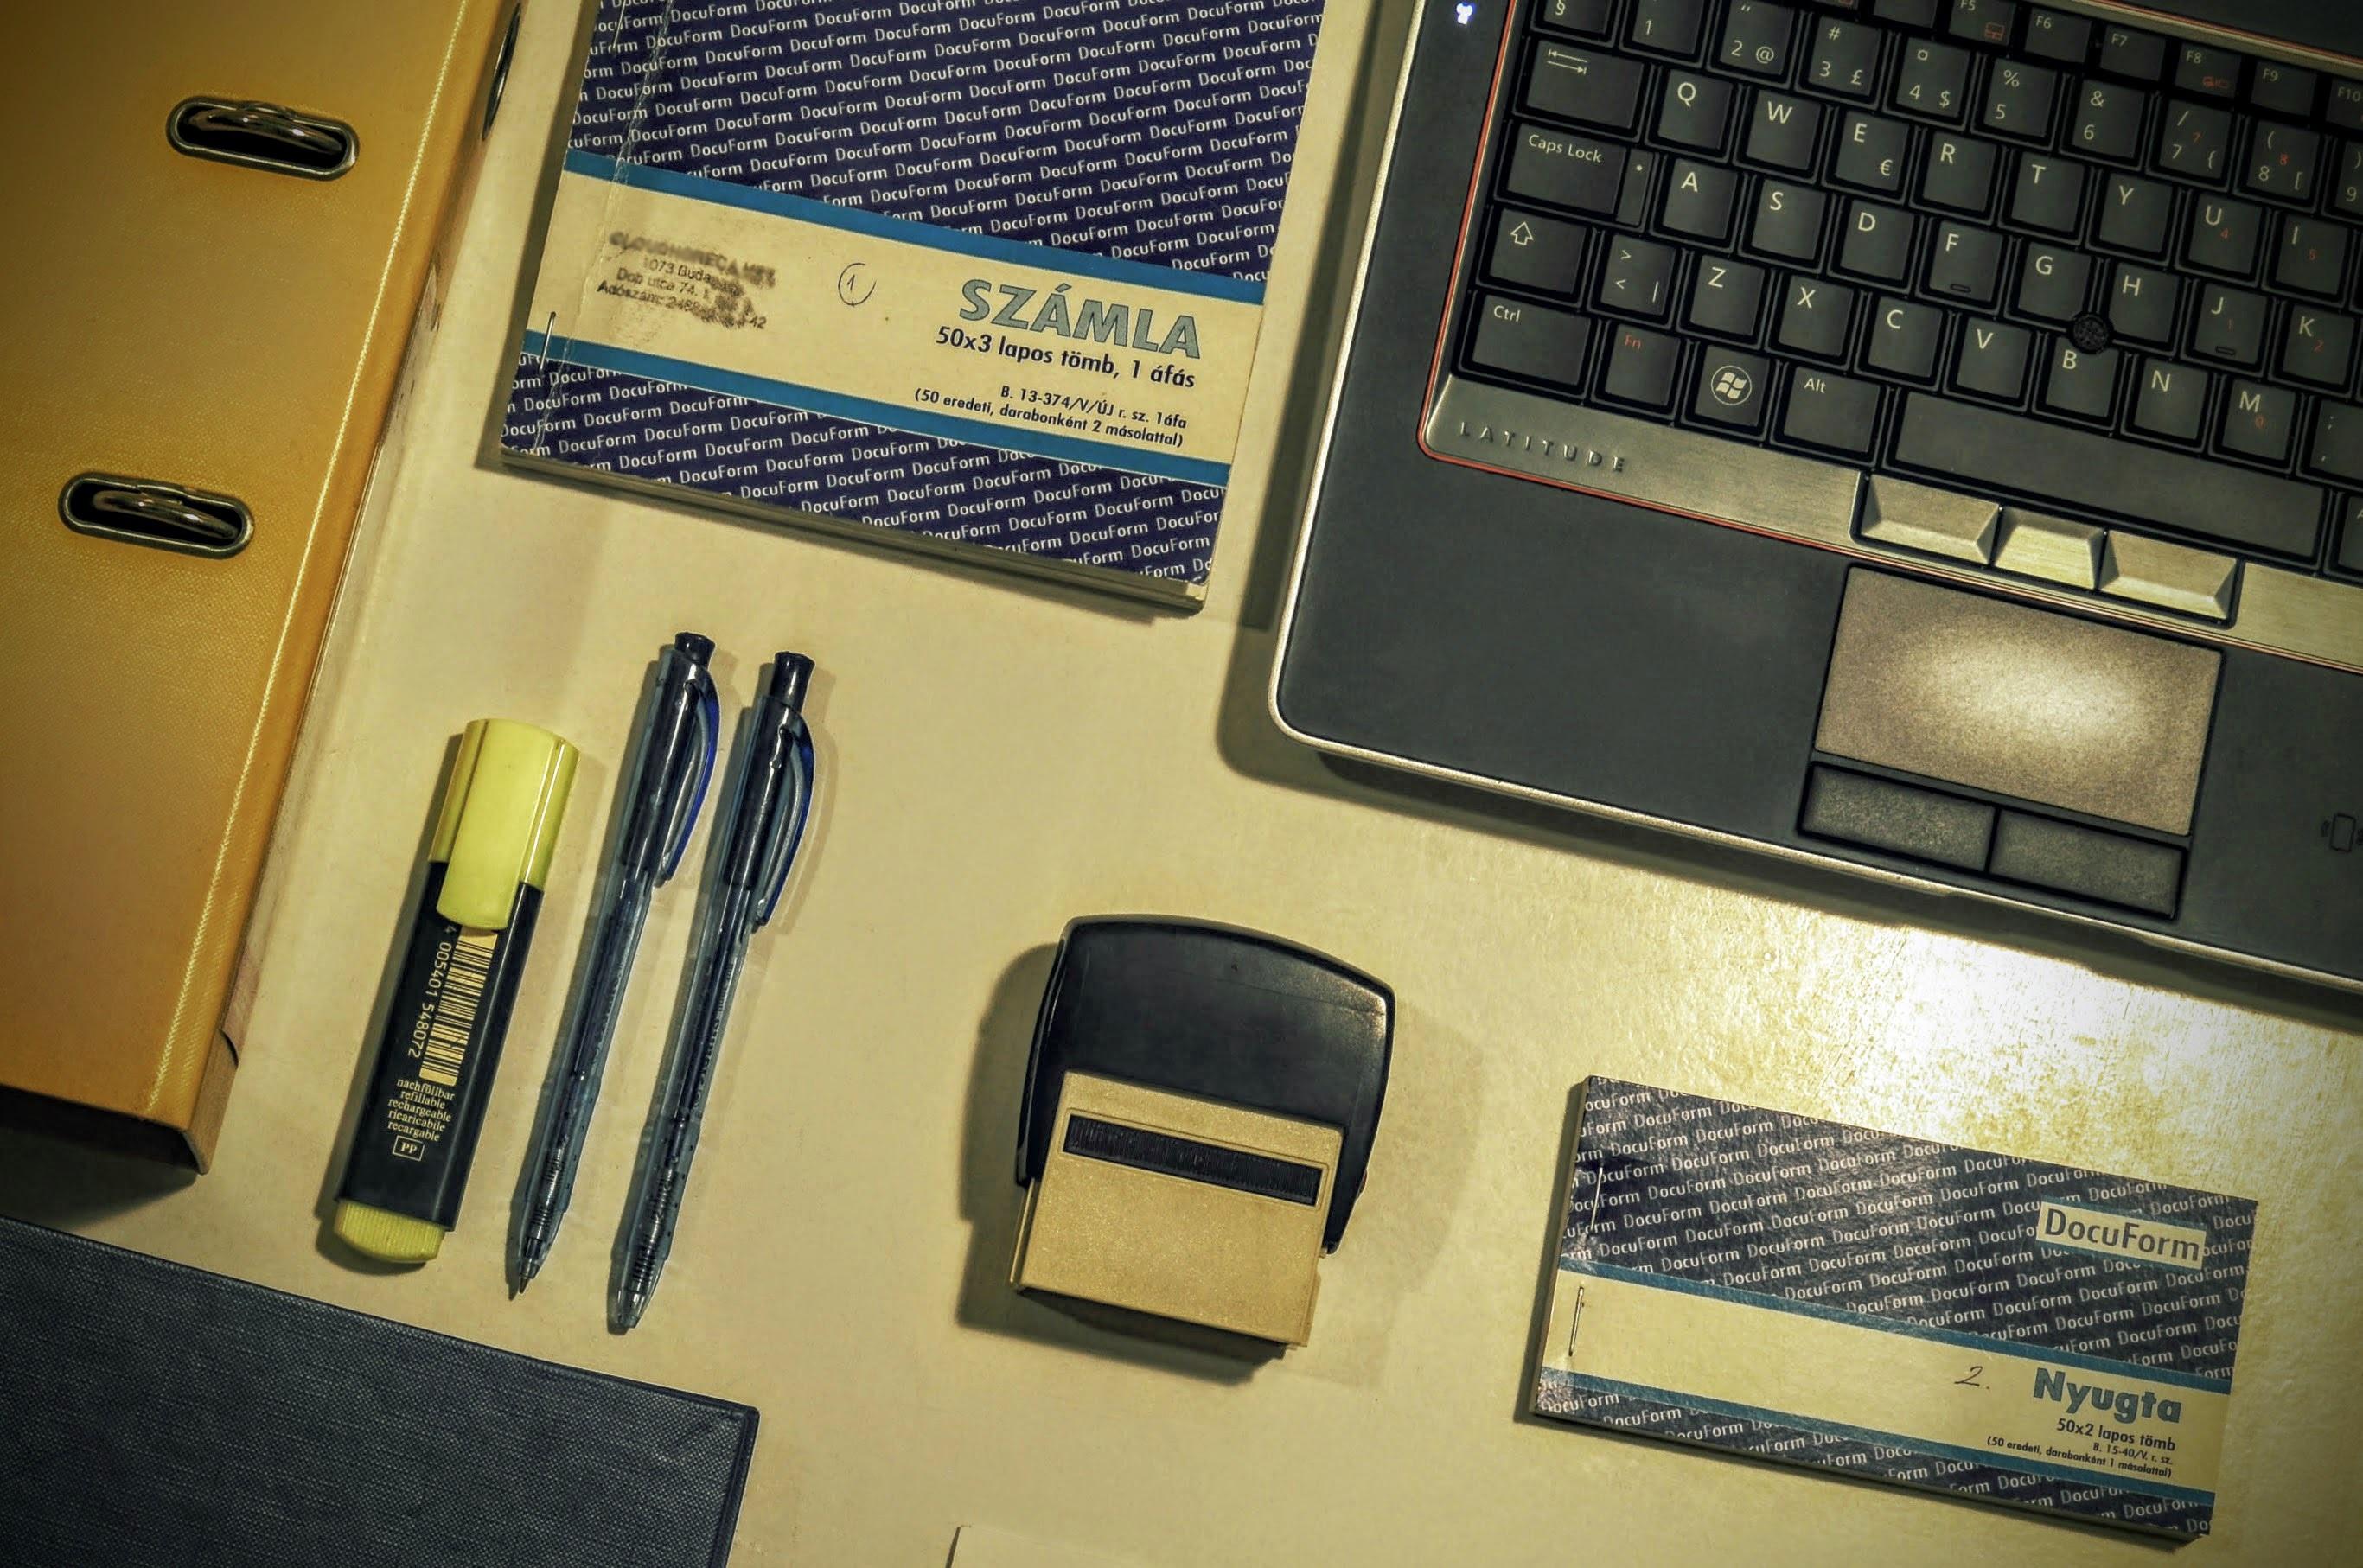 free images laptop desk keyboard technology pen office